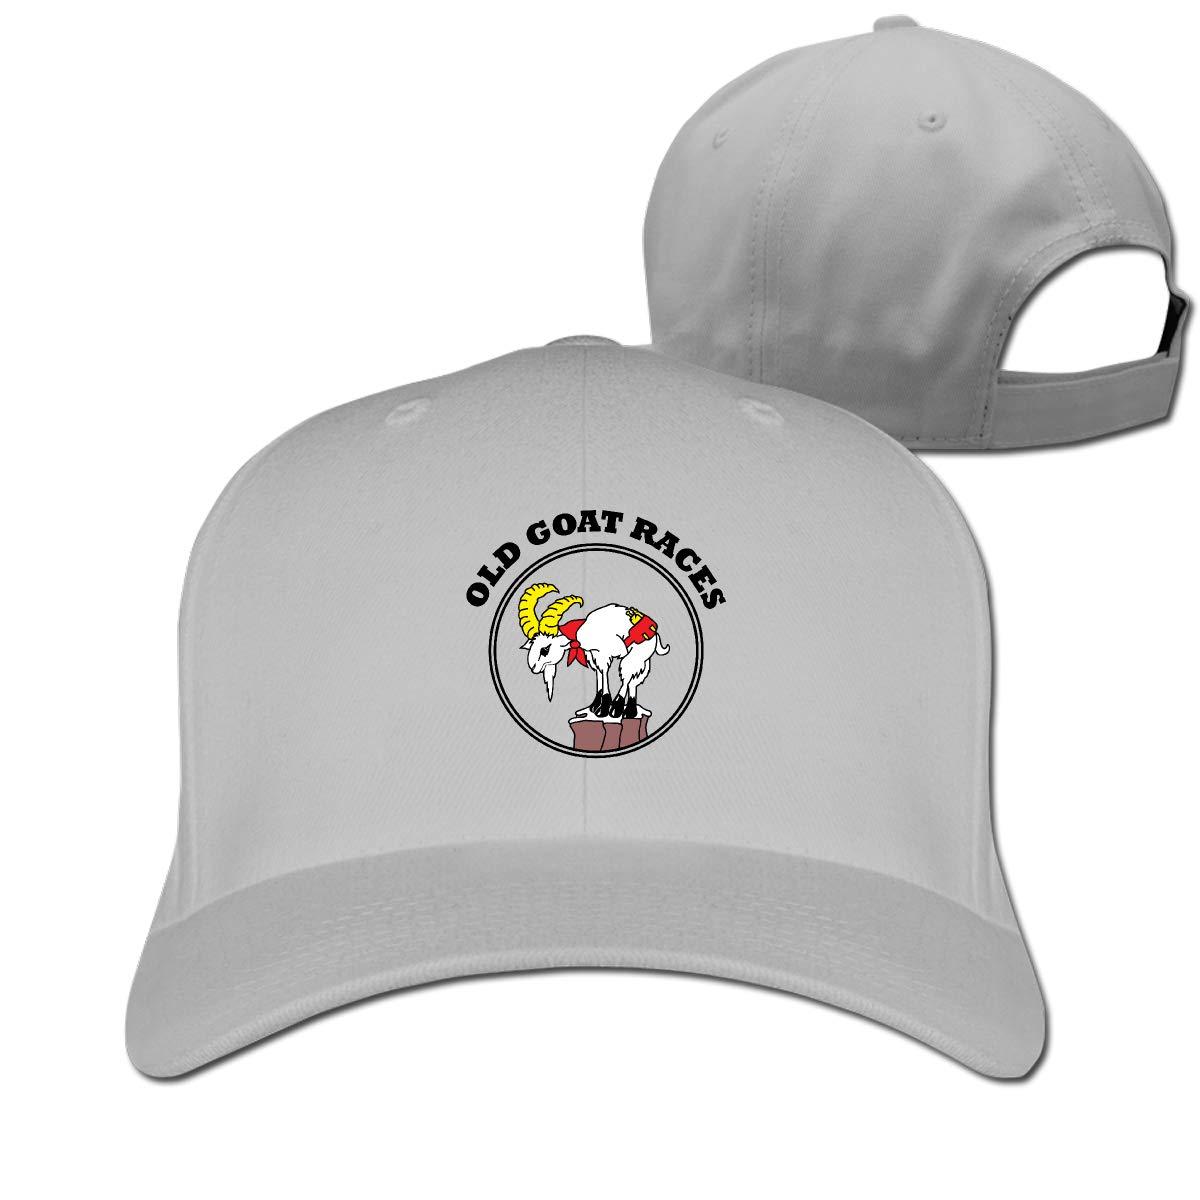 Goat Logo Fashion Adjustable Cotton Baseball Caps Trucker Driver Hat Outdoor Cap Gray